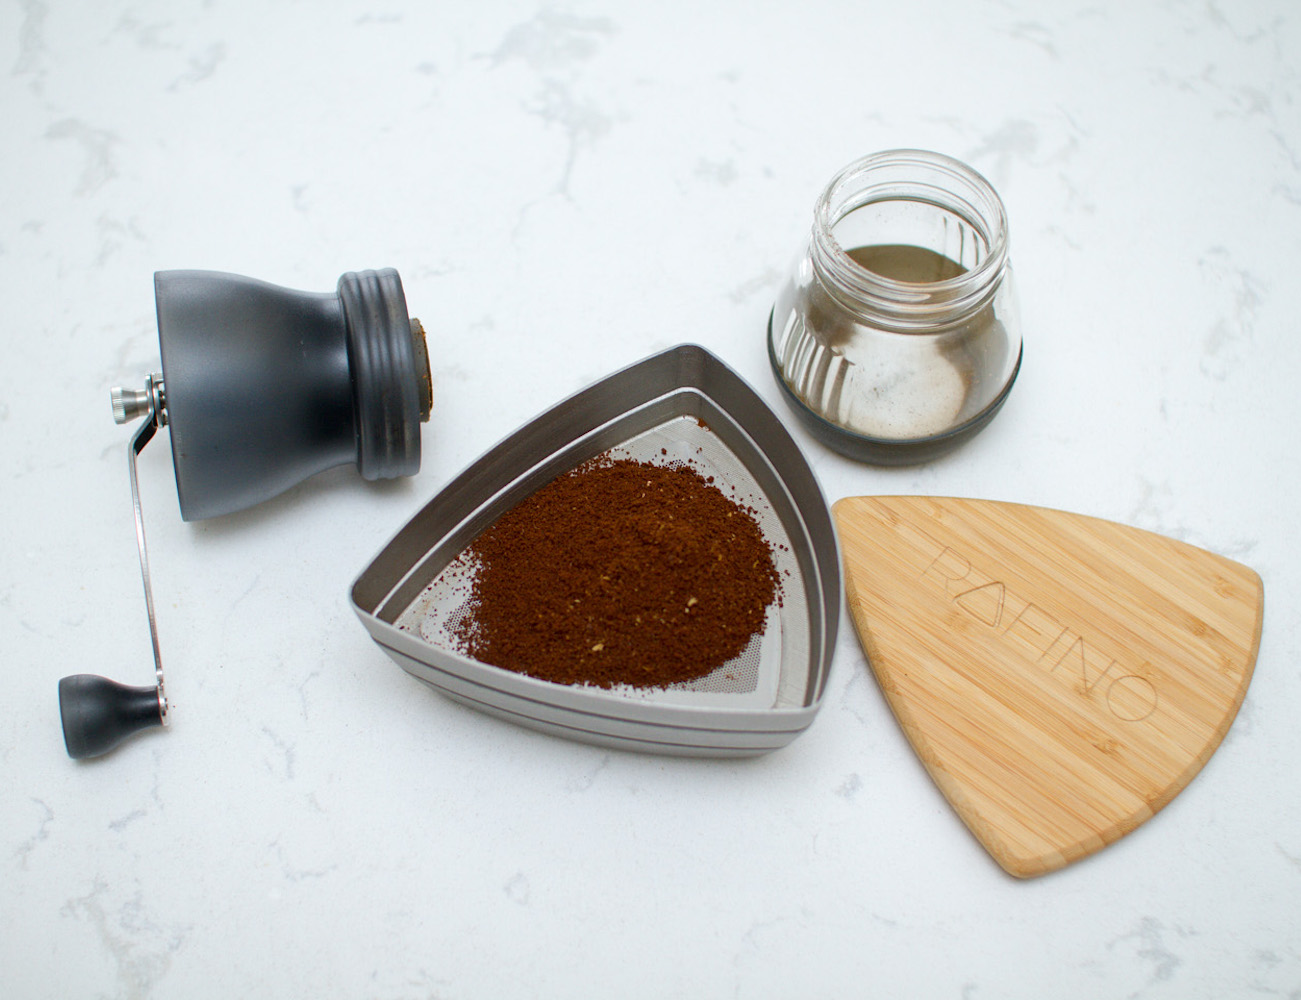 RAFINO – World's First Coffee Sieve System